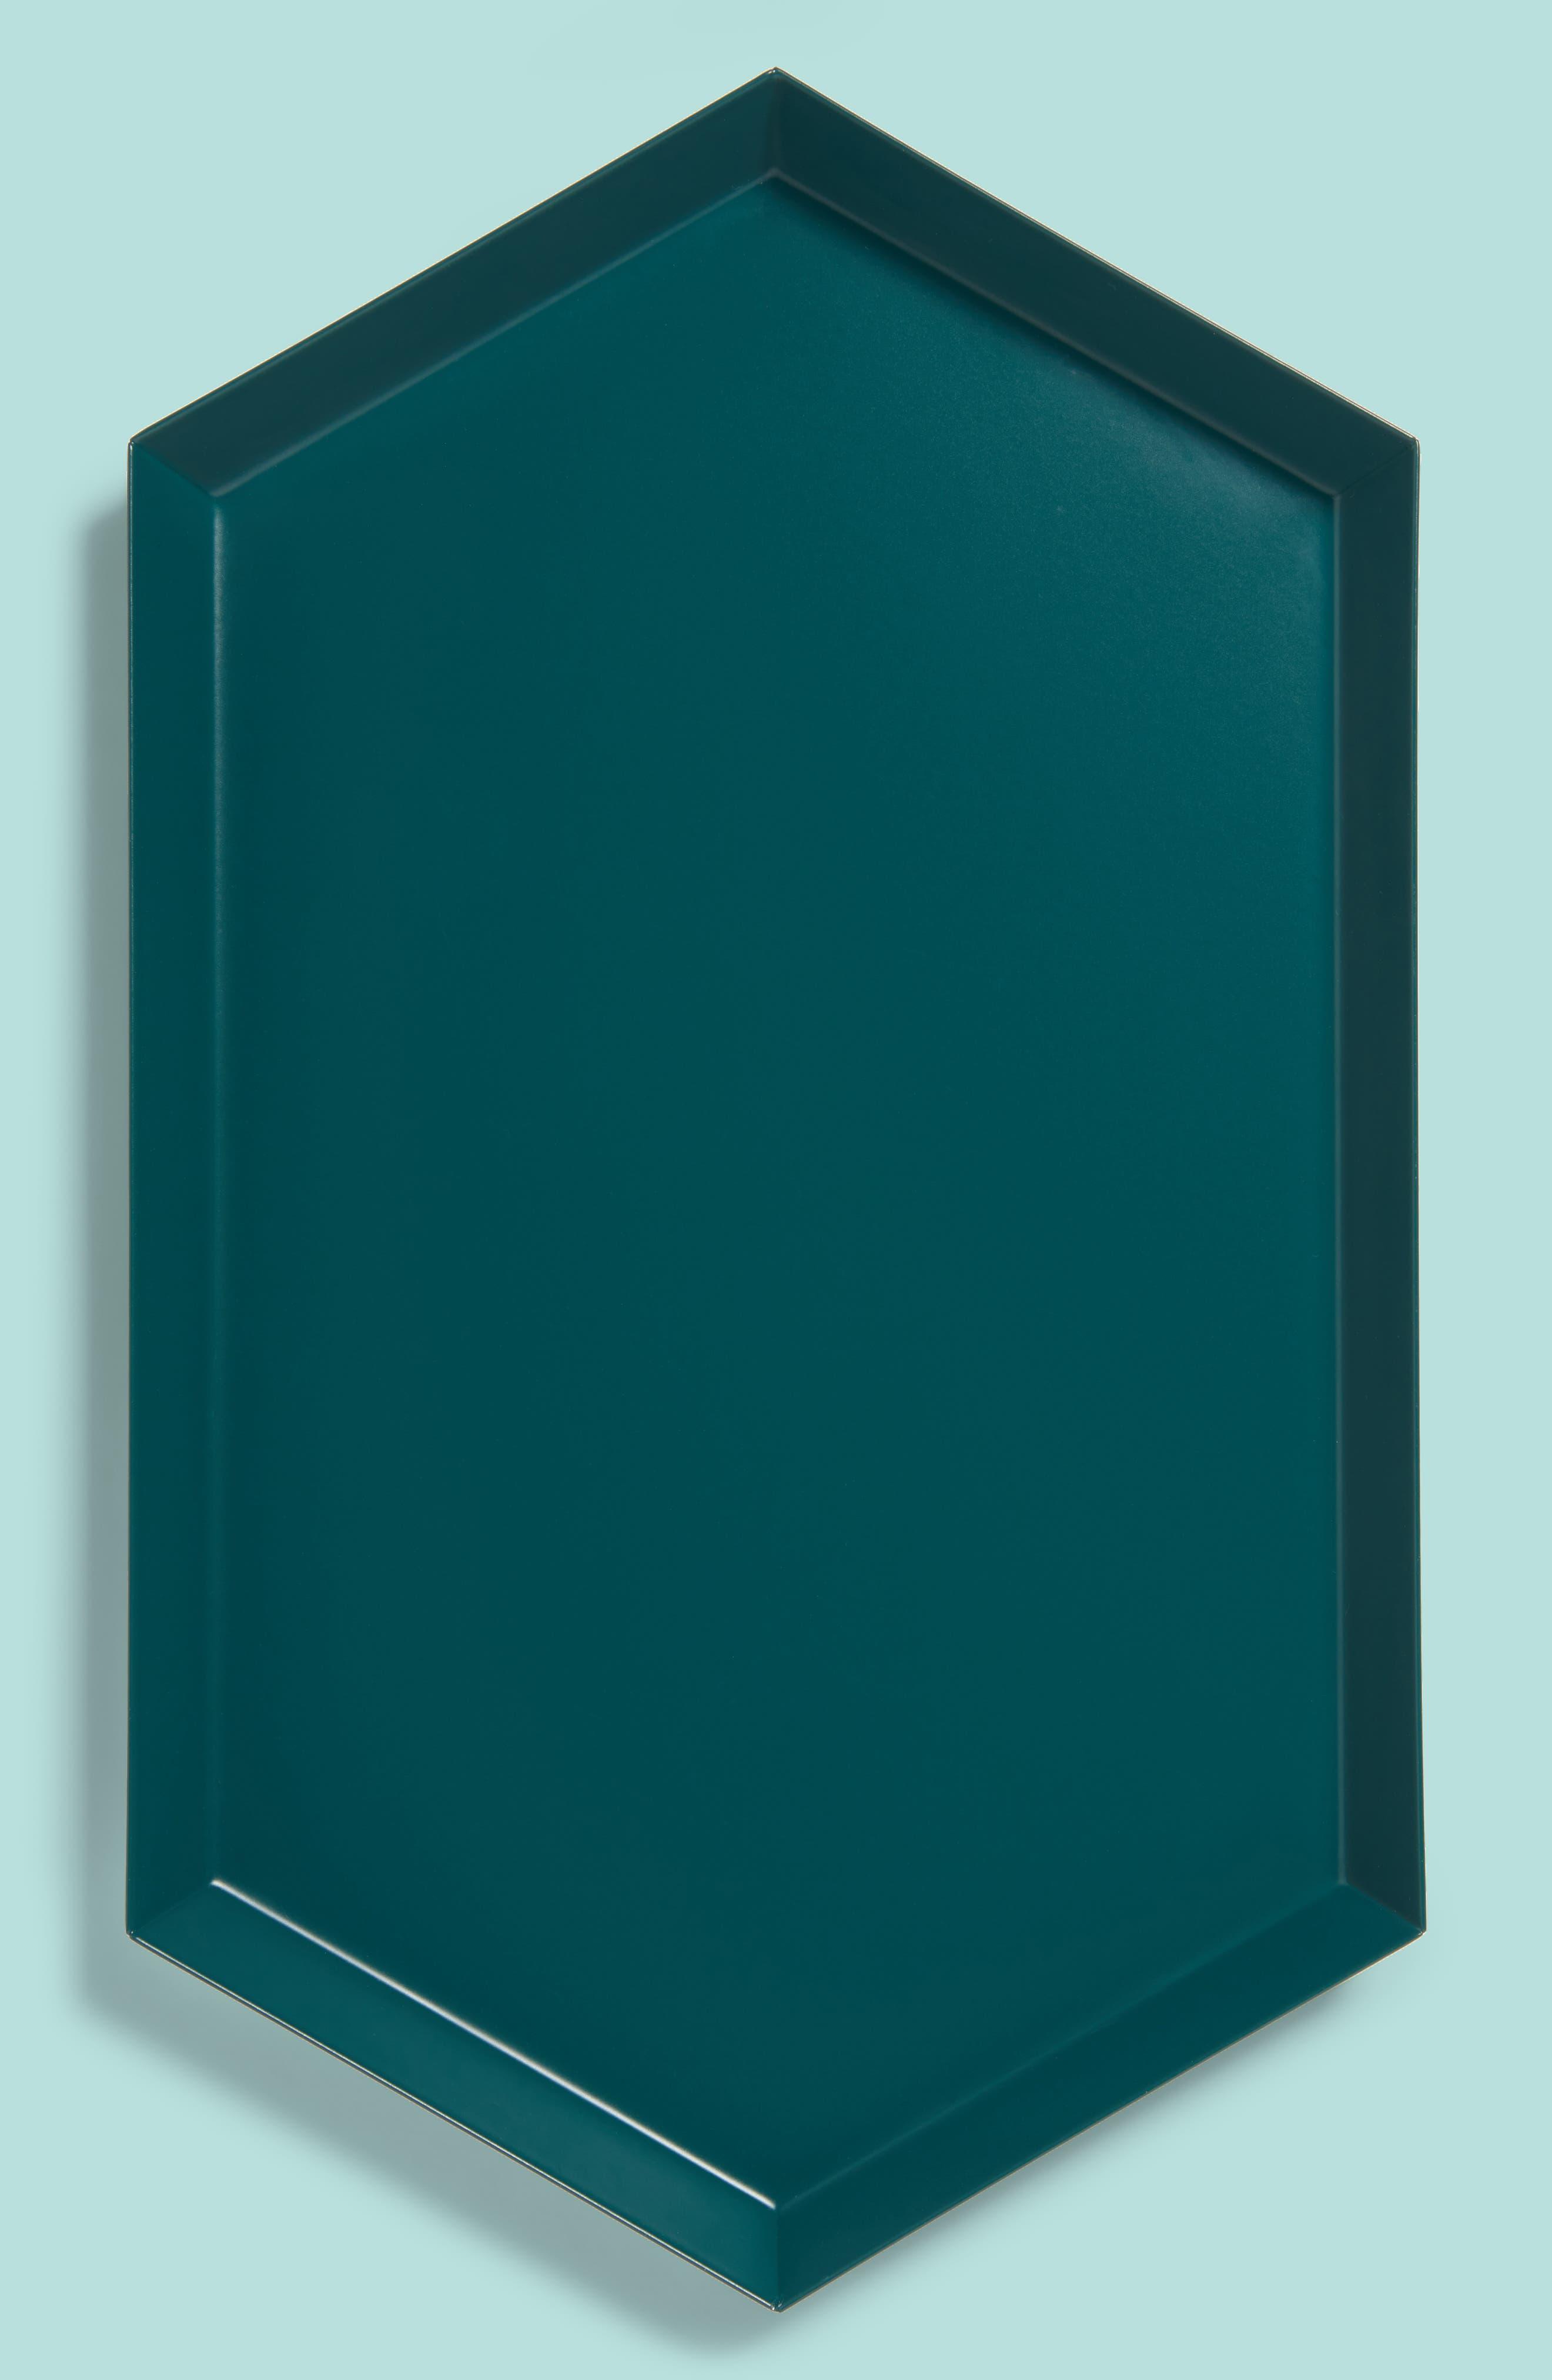 Medium Kaleido Powder Coated Steel Tray,                             Main thumbnail 1, color,                             Dark Green